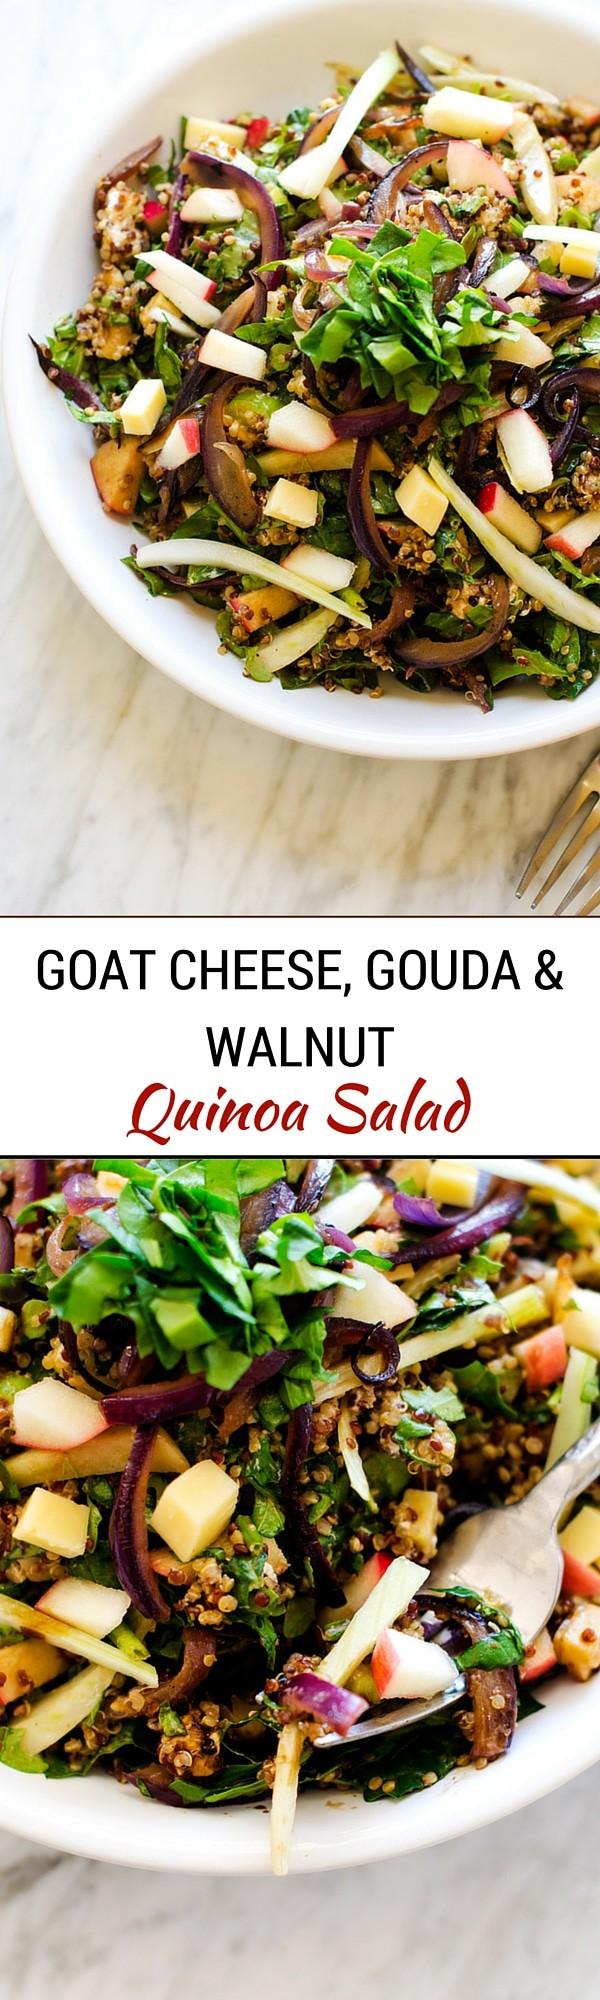 Goat Cheese, Gouda & Walnut Quinoa Salad - WendyPolisi.com